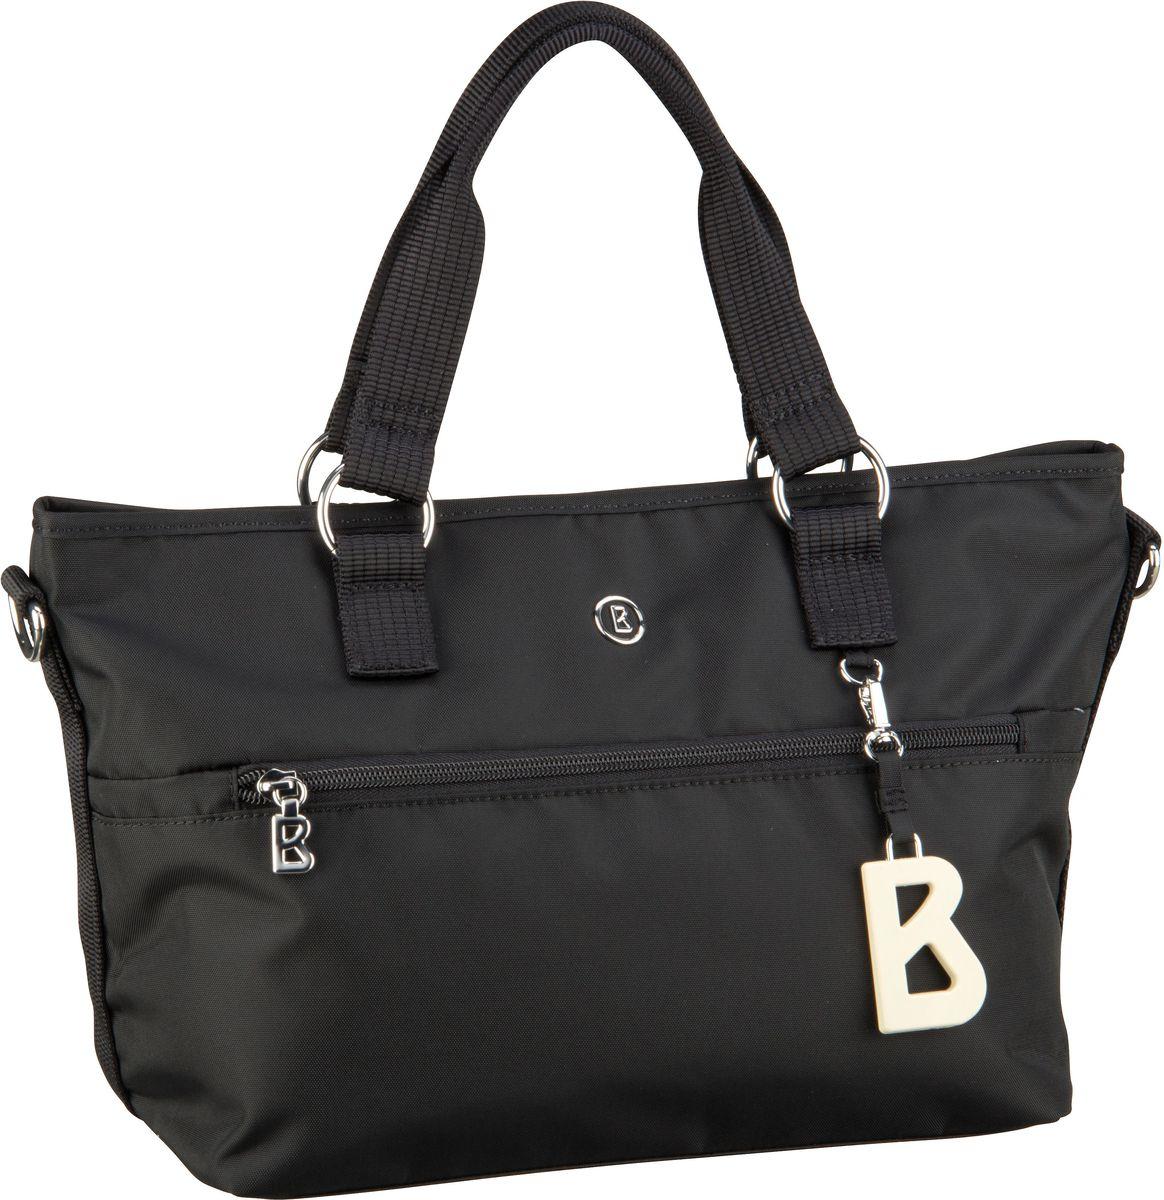 Handtasche Verbier Gesa Handbag SHZ Black